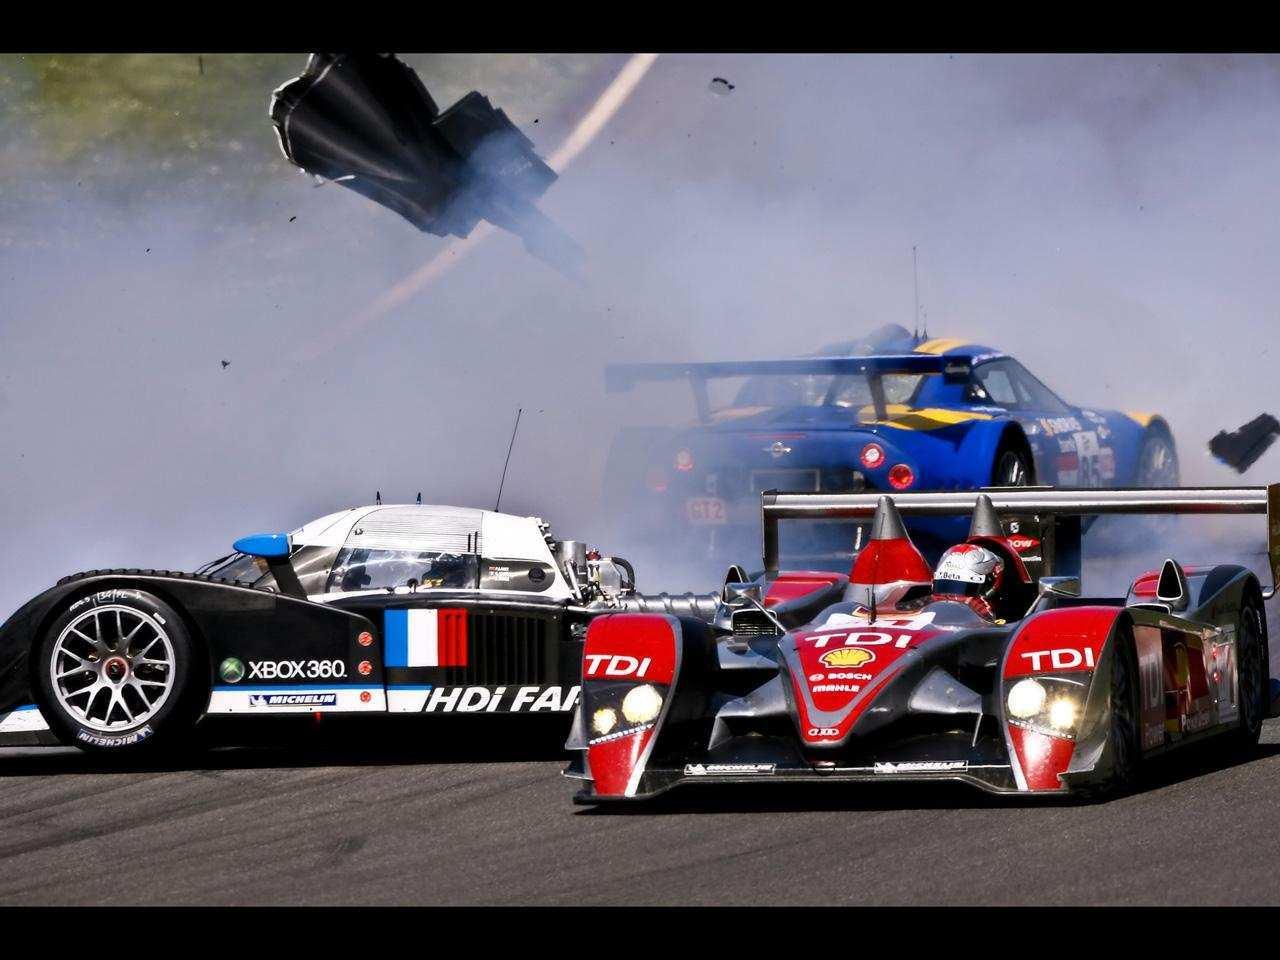 77 Gallery of Peugeot Le Mans 2020 Review with Peugeot Le Mans 2020